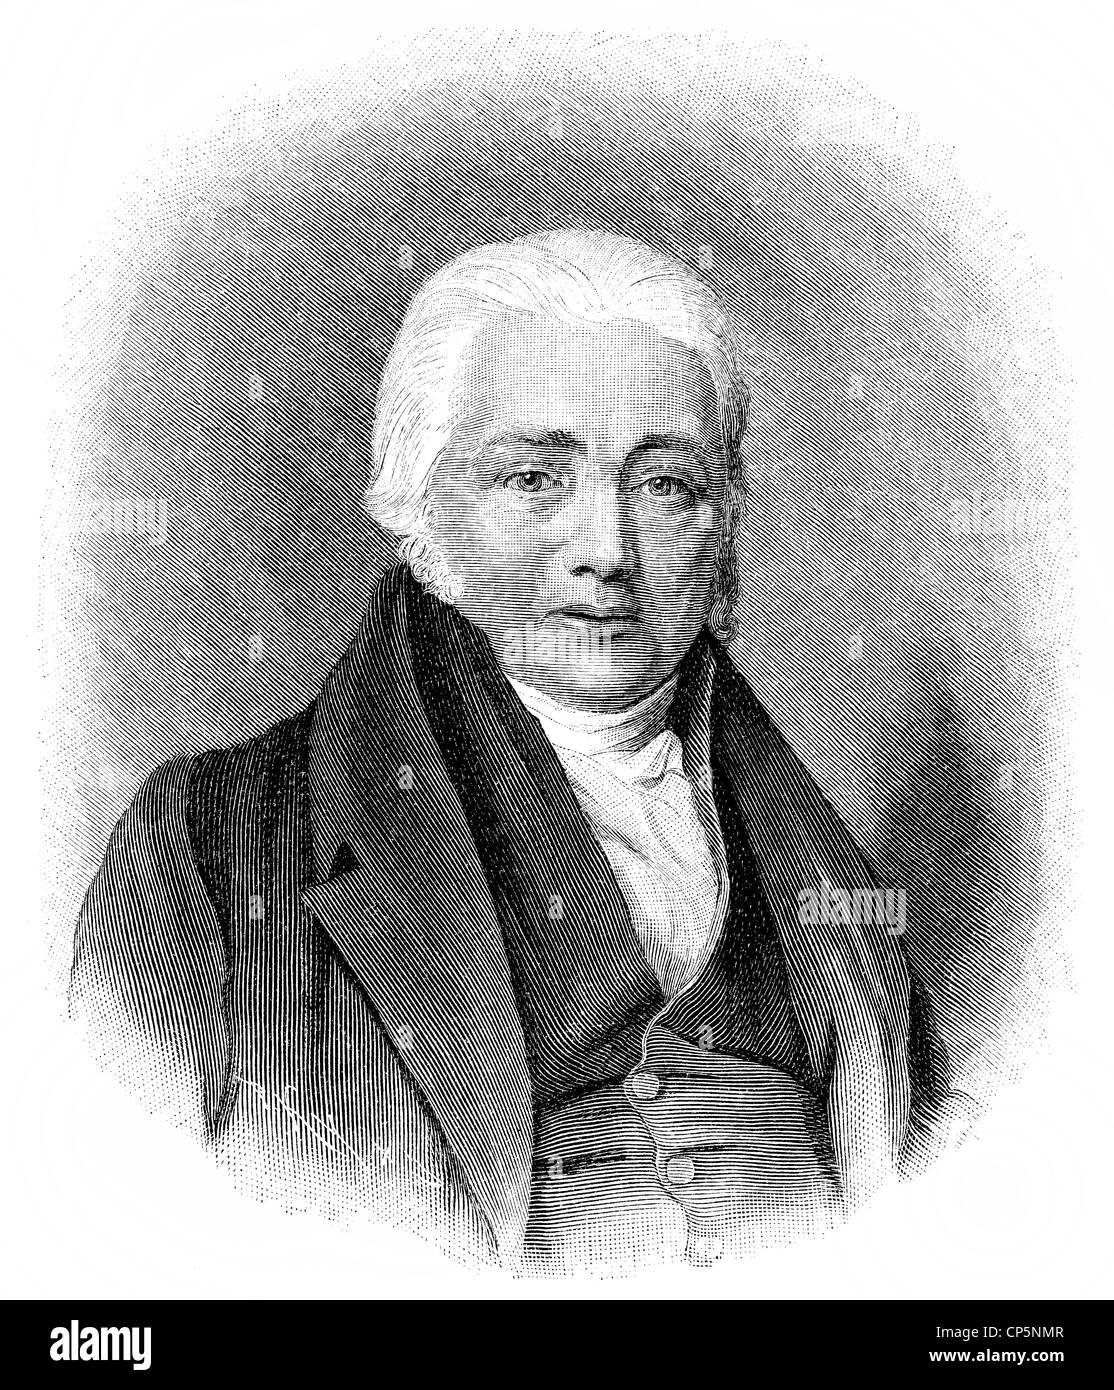 Samuel Taylor Coleridge, 1772 - 1834, an English Romantic poet, critic and philosopher - Stock Image